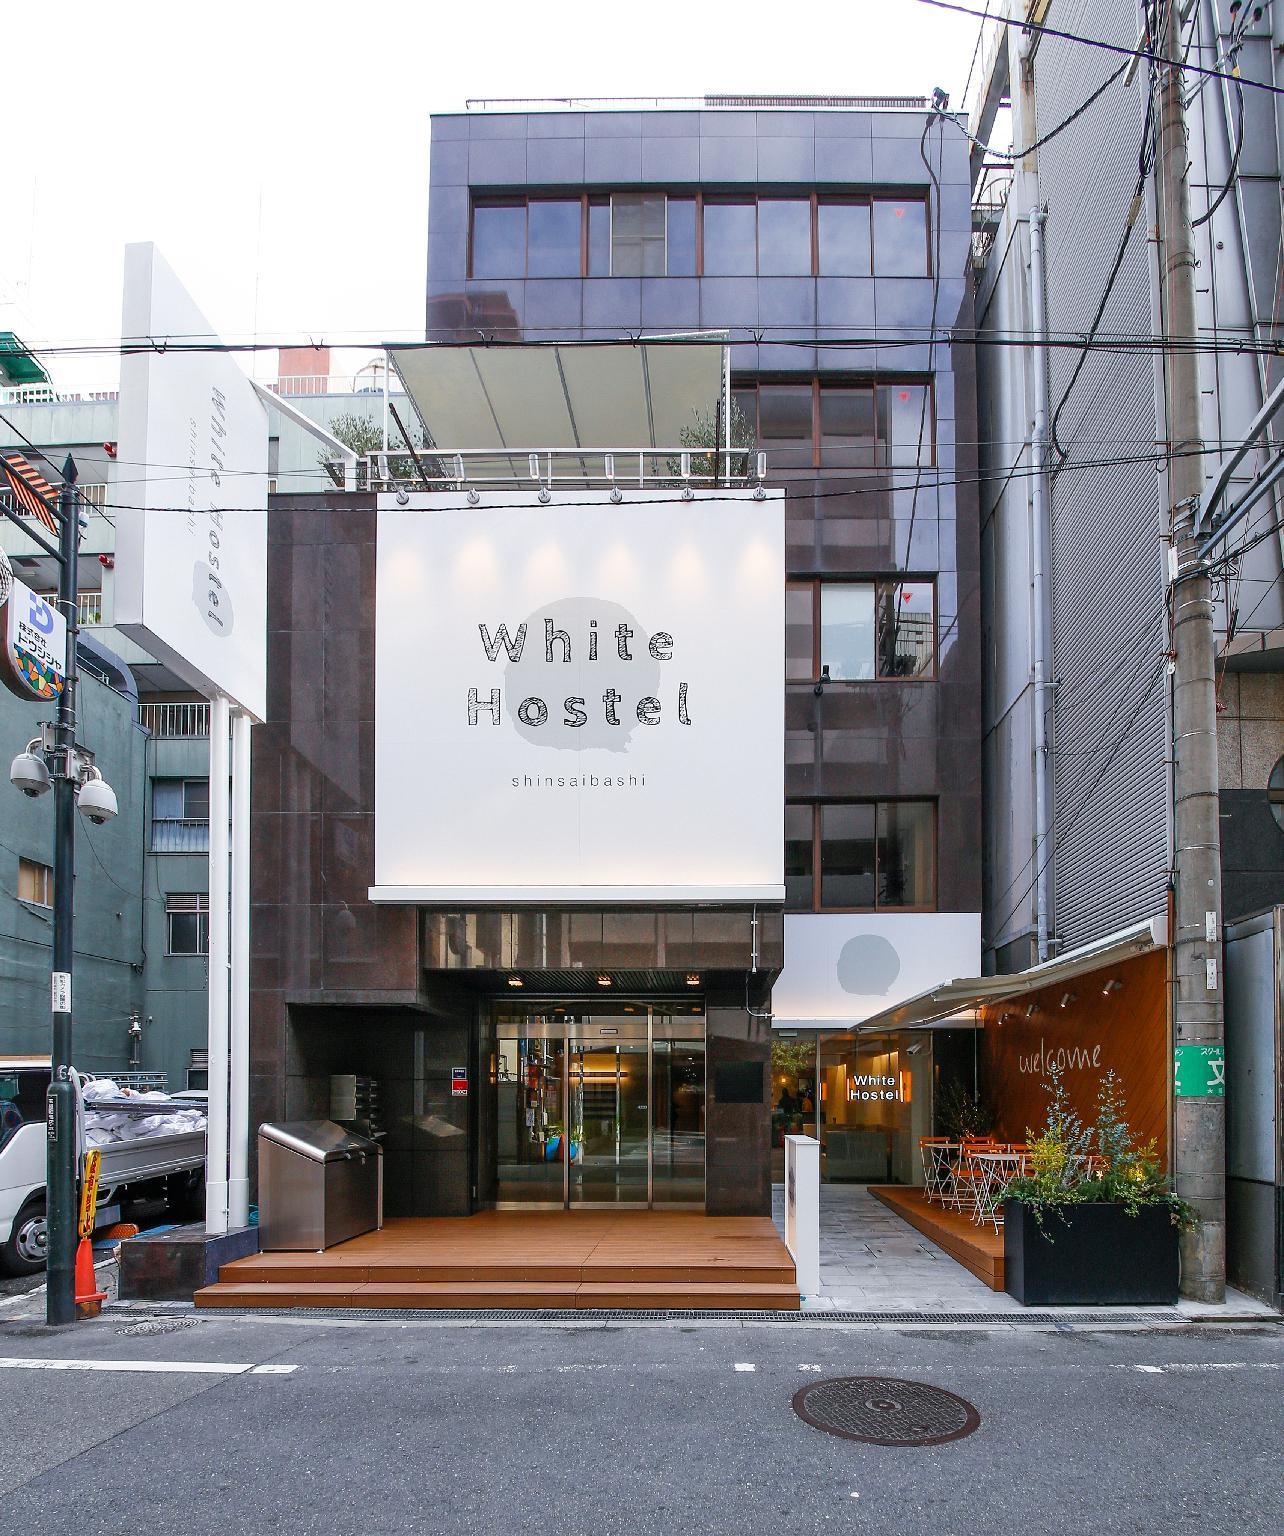 White Hostel Shinsaibashi